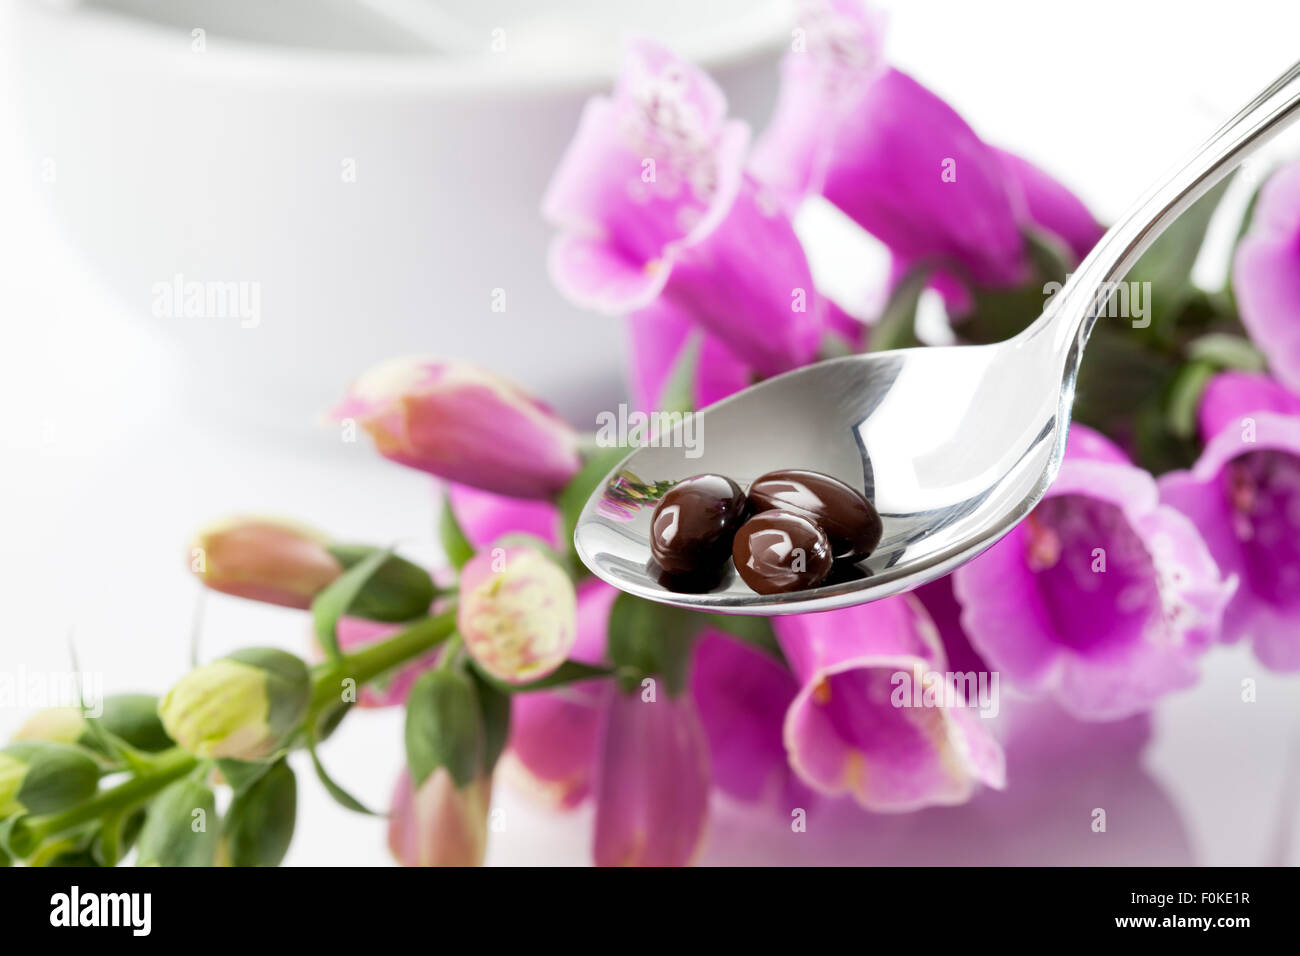 Foxglove, Digitalis purpurea, medical plant, spoon with capsules - Stock Image